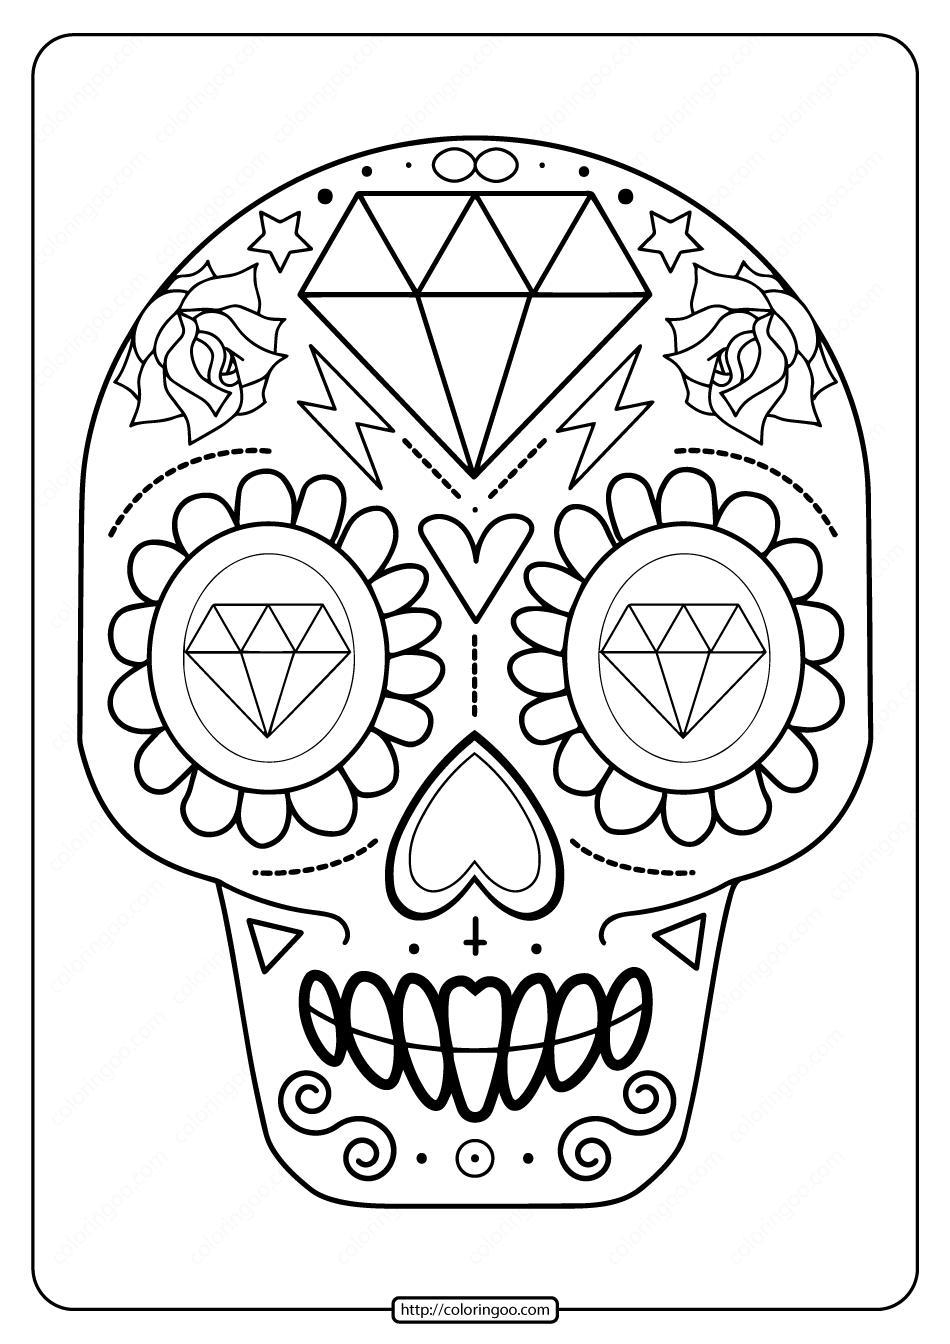 Printable Sugar Skull Pdf Coloring Pages 08